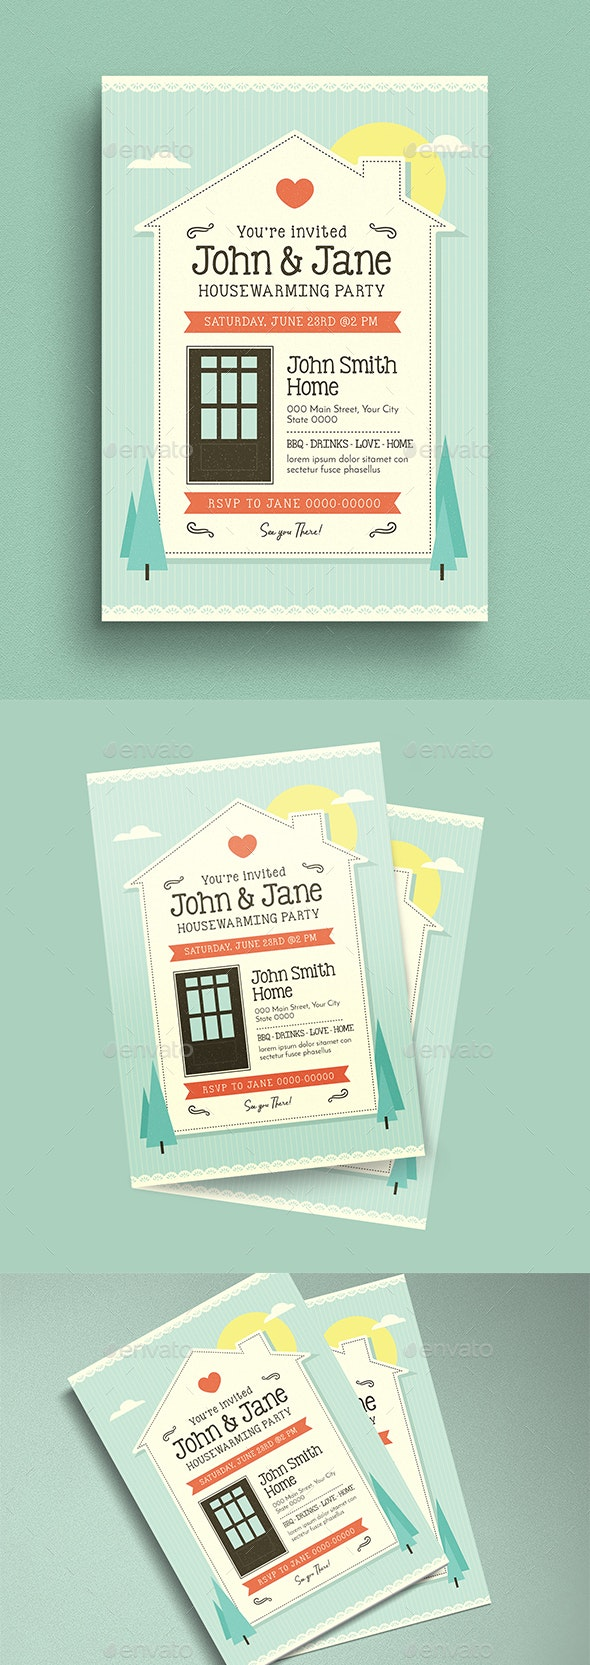 House Warming Flyer/Invitation - Cards & Invites Print Templates